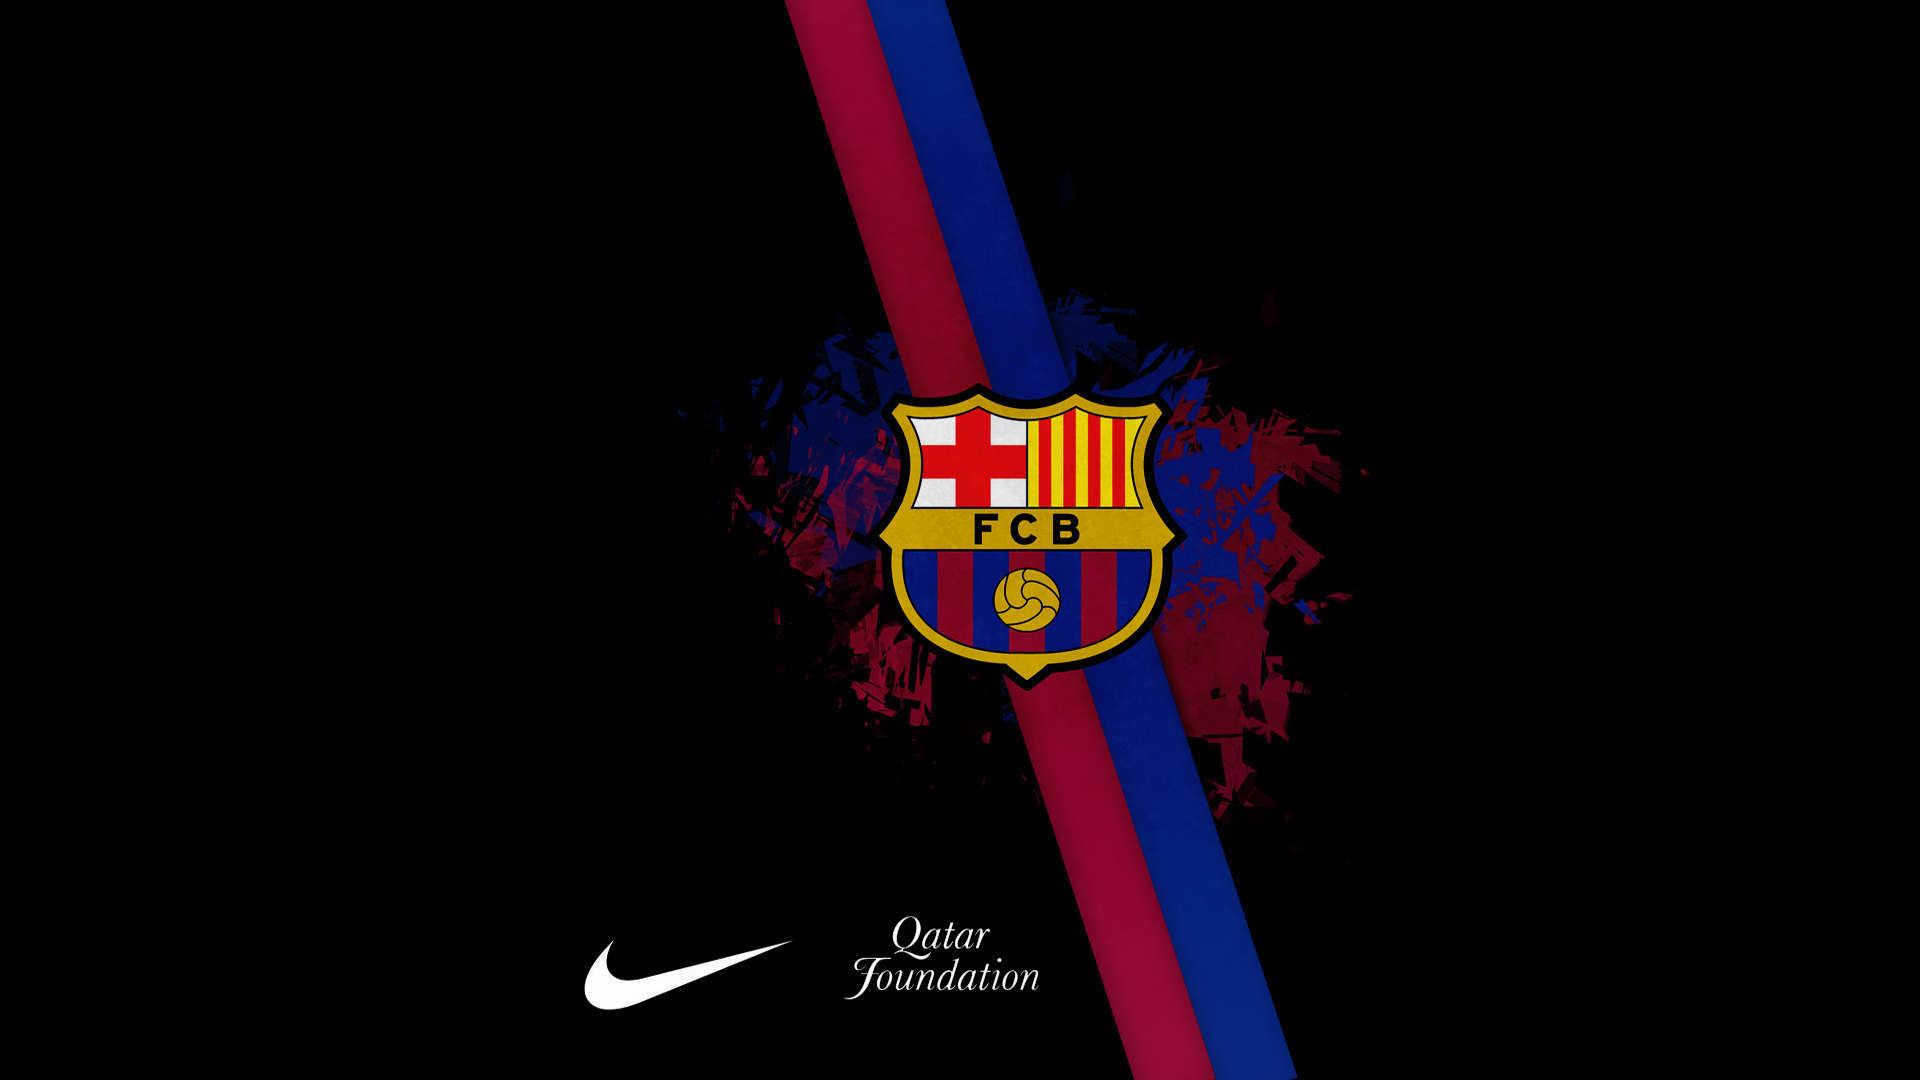 Best-ideas-about-Fc-Barcelona-on-Pinterest-Barcelona-soccer-%C3%97-Imagenes-De-Barca-wallpaper-wp3403136